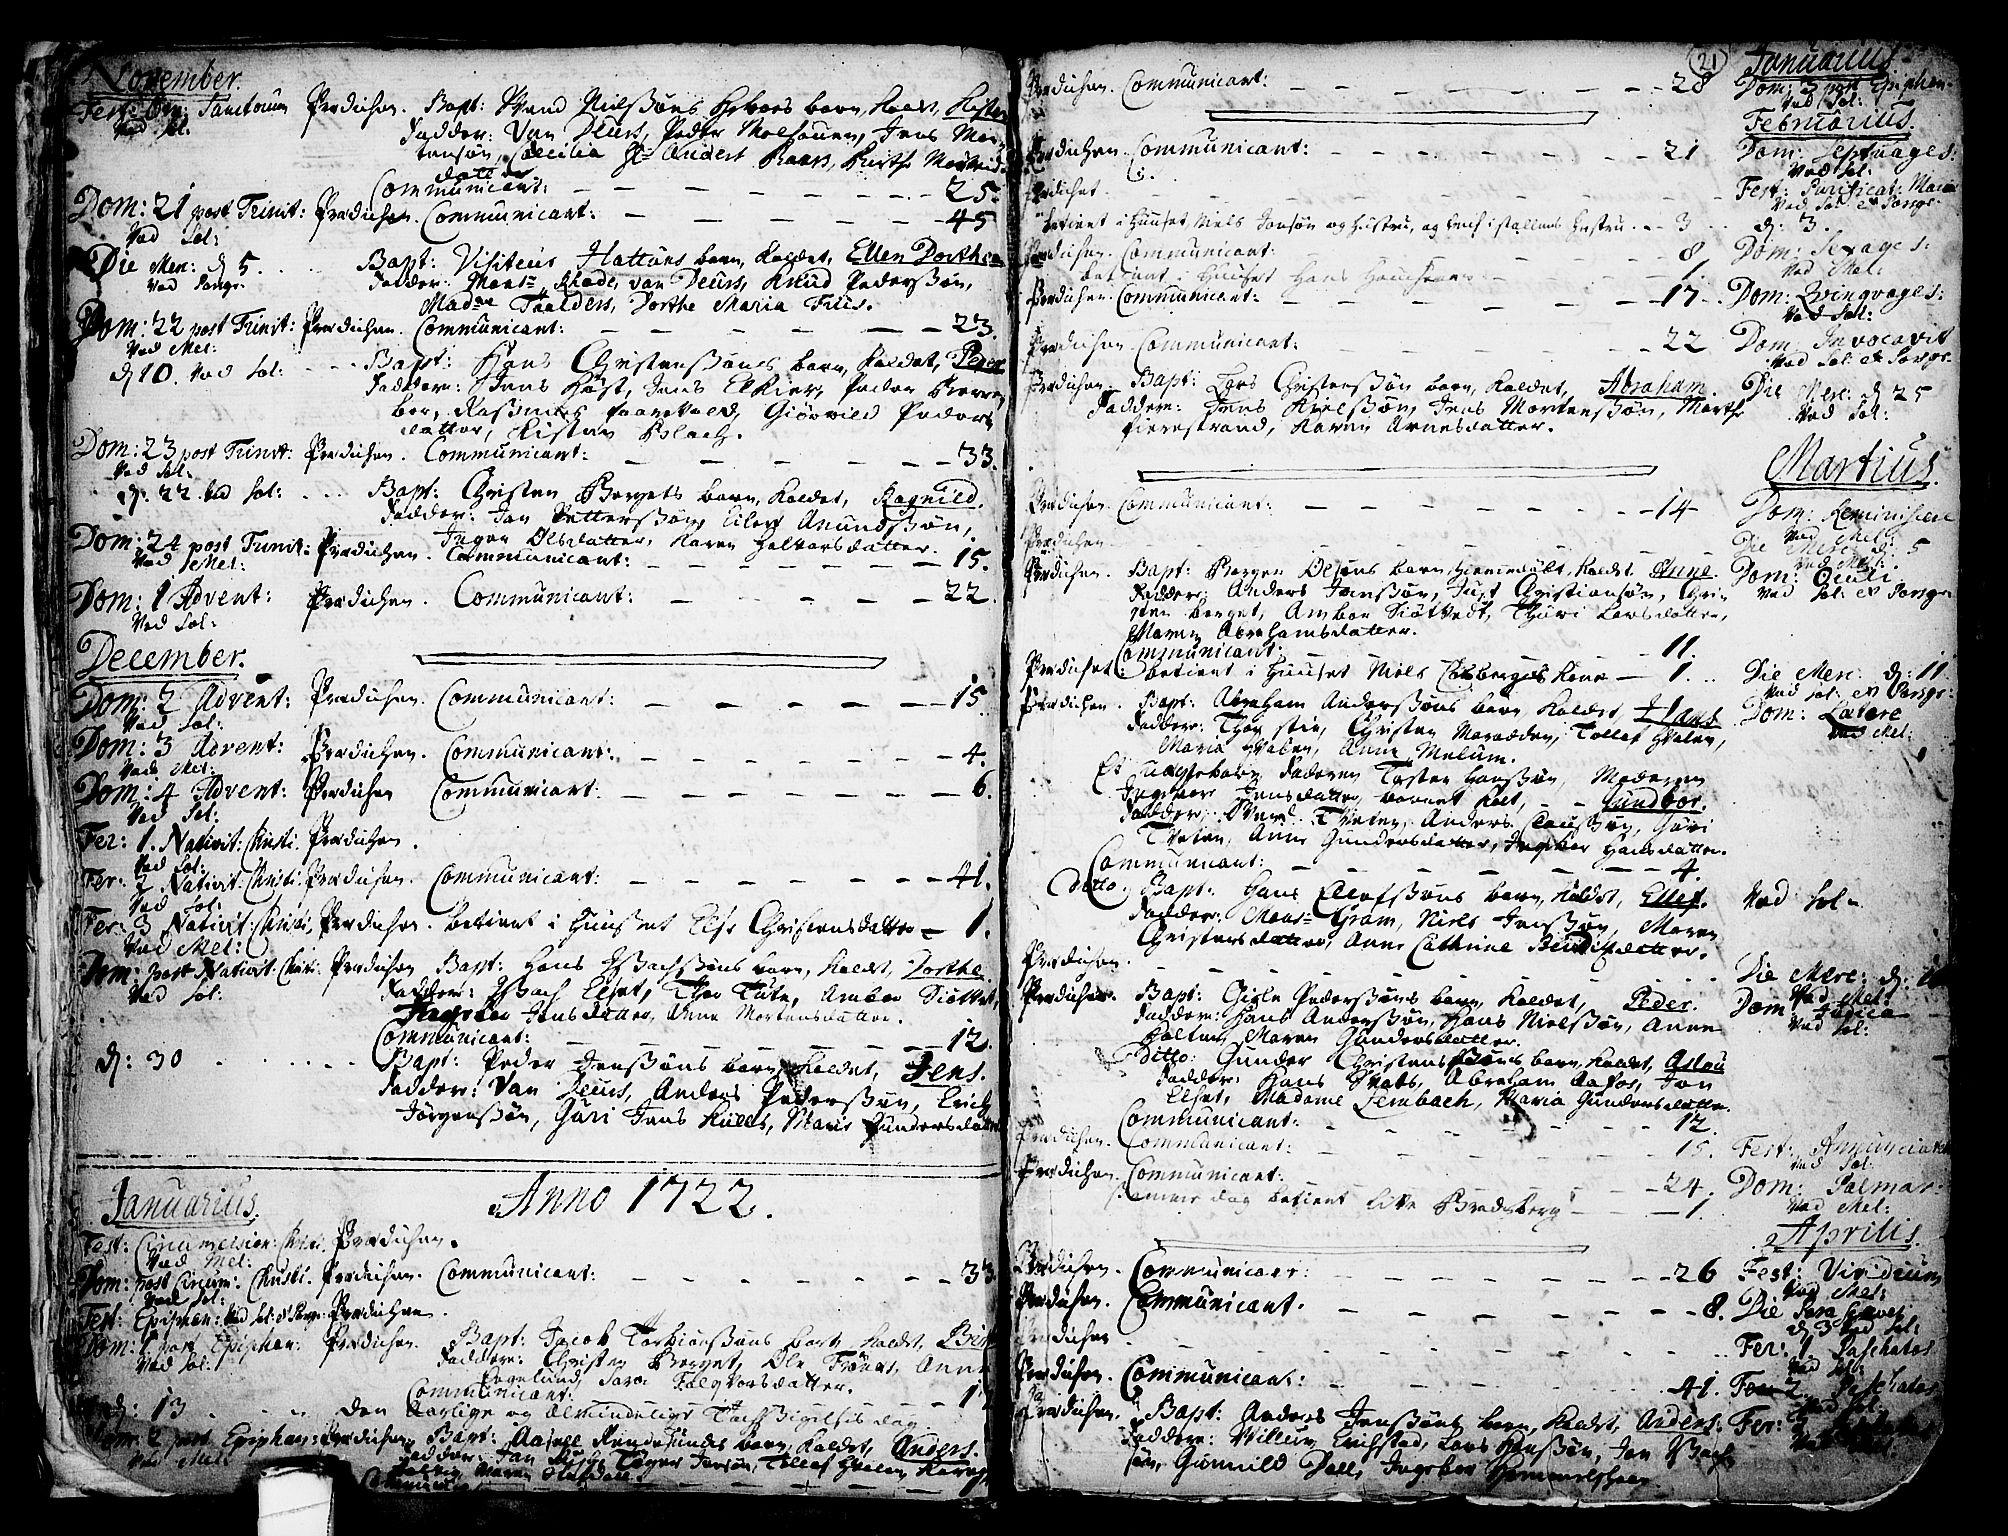 SAKO, Solum kirkebøker, F/Fa/L0002: Ministerialbok nr. I 2, 1713-1761, s. 21